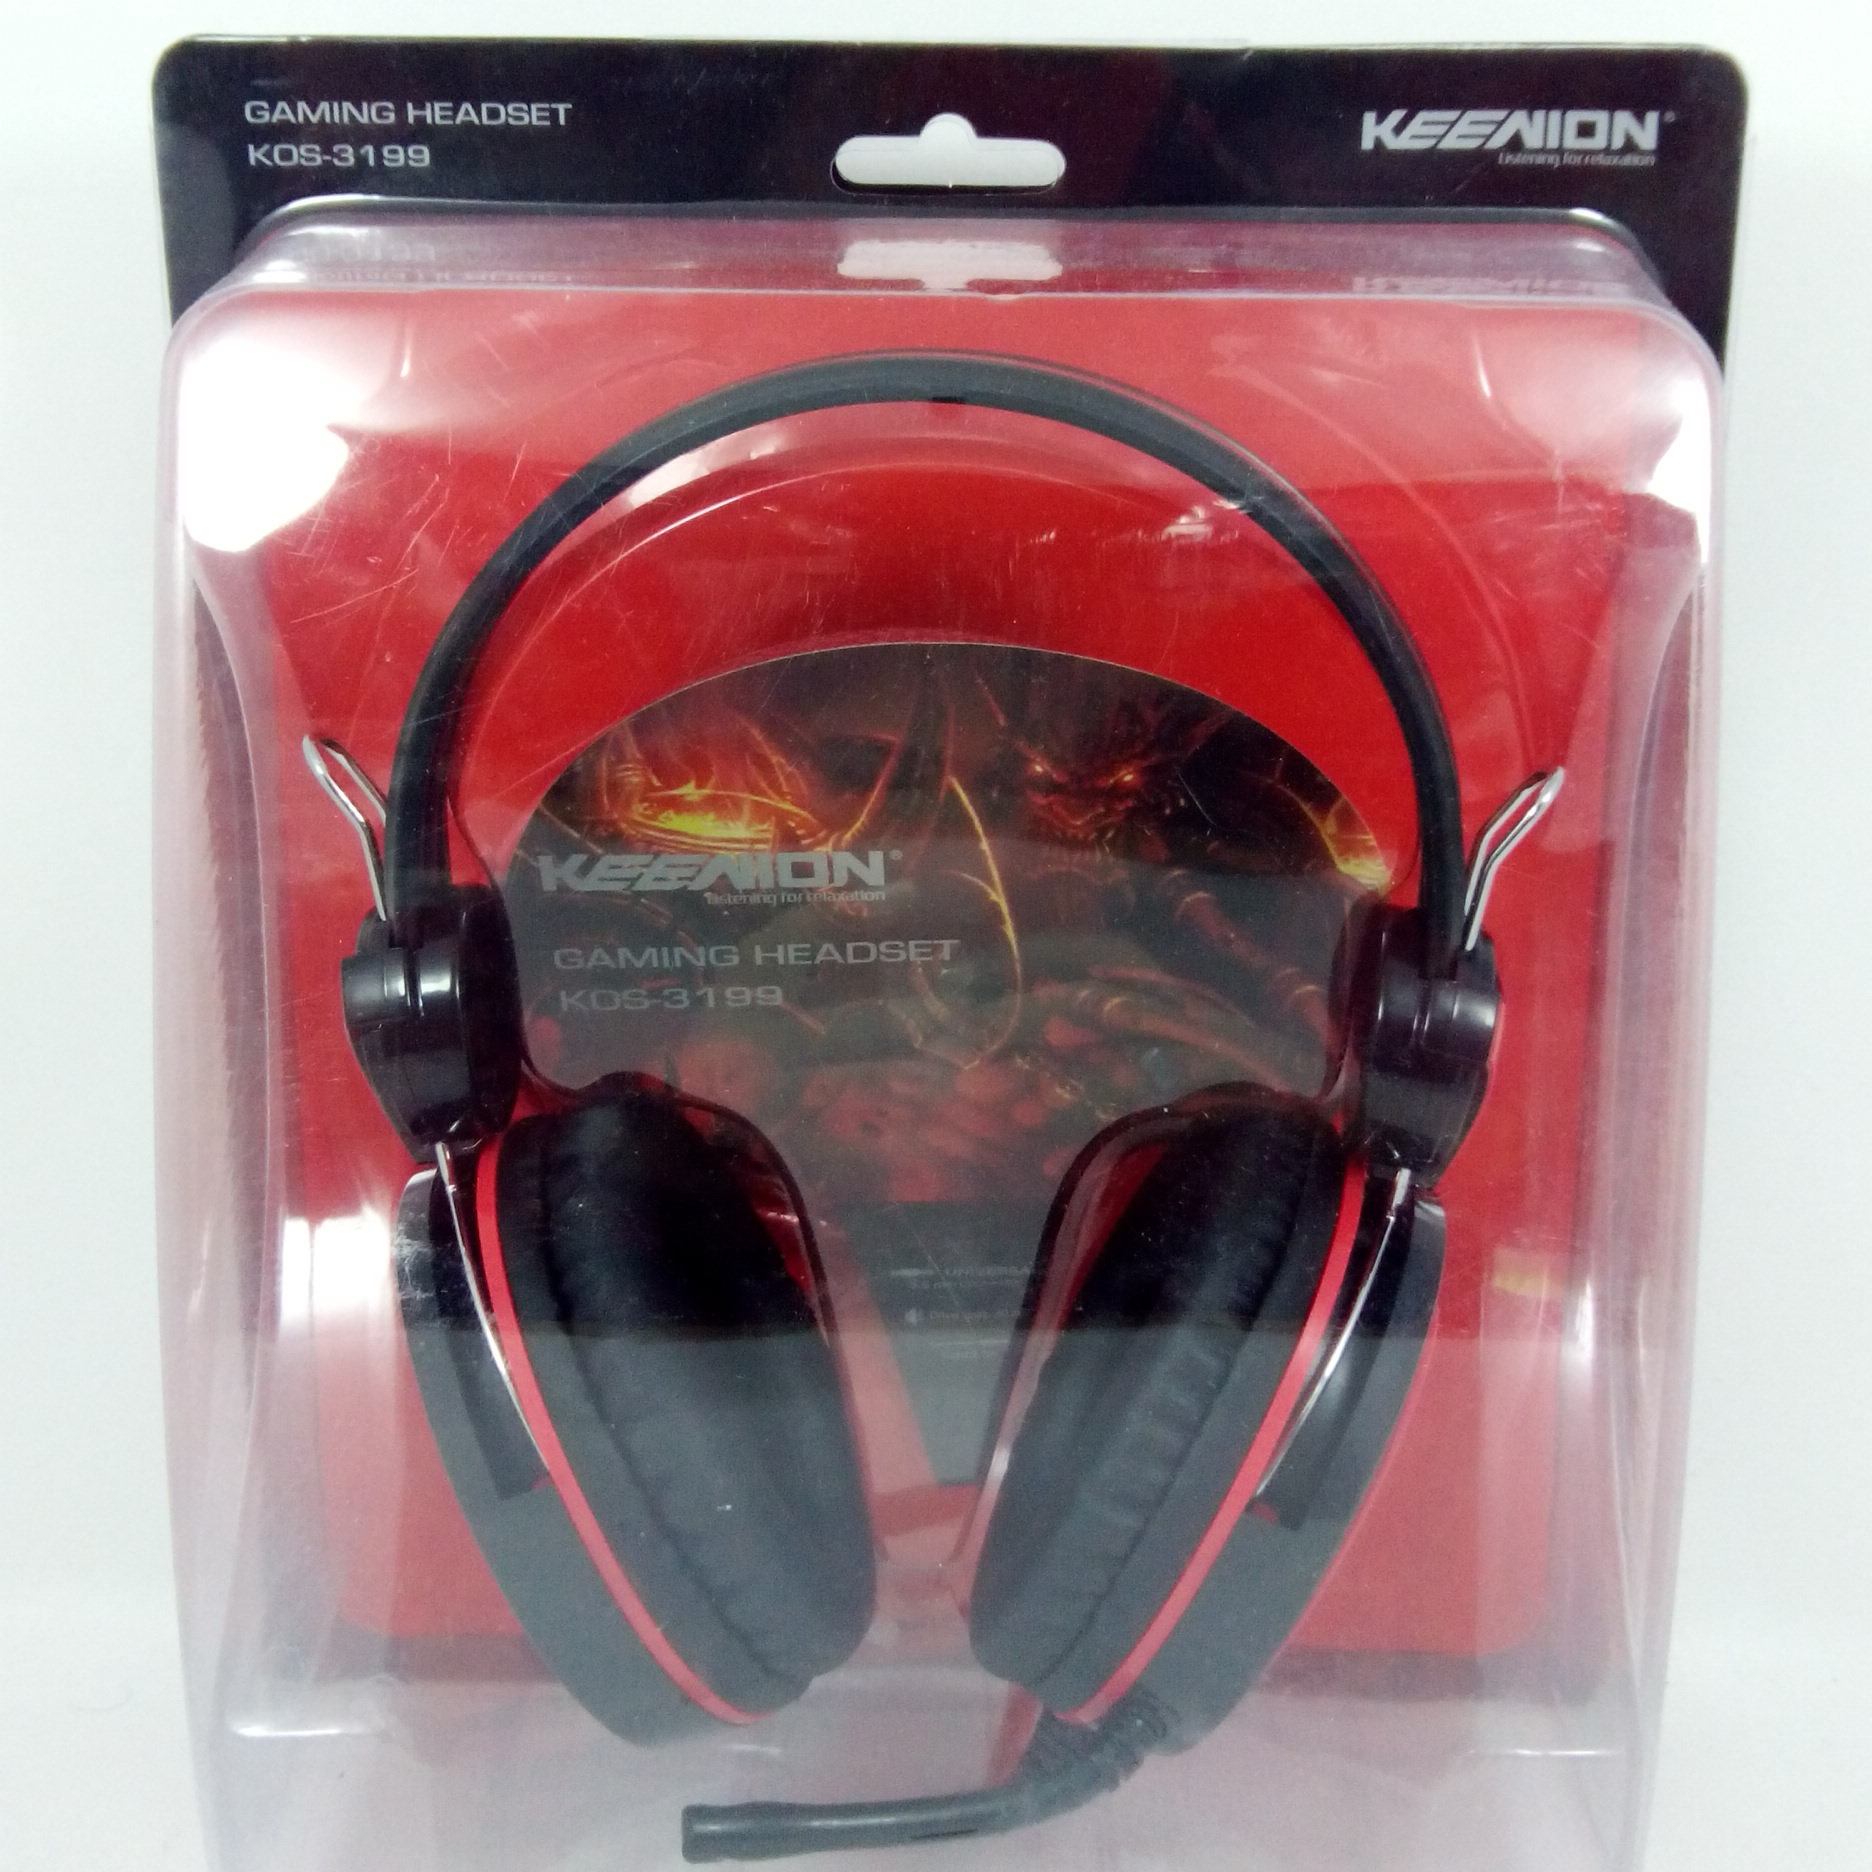 Keenion Headset Kos 699 Hitam Daftar Update Harga Terbaru Dan 803 Headphone Original Blue Jual Gaming 9199 Stereo Bass Hesti D Shop Tokopedia